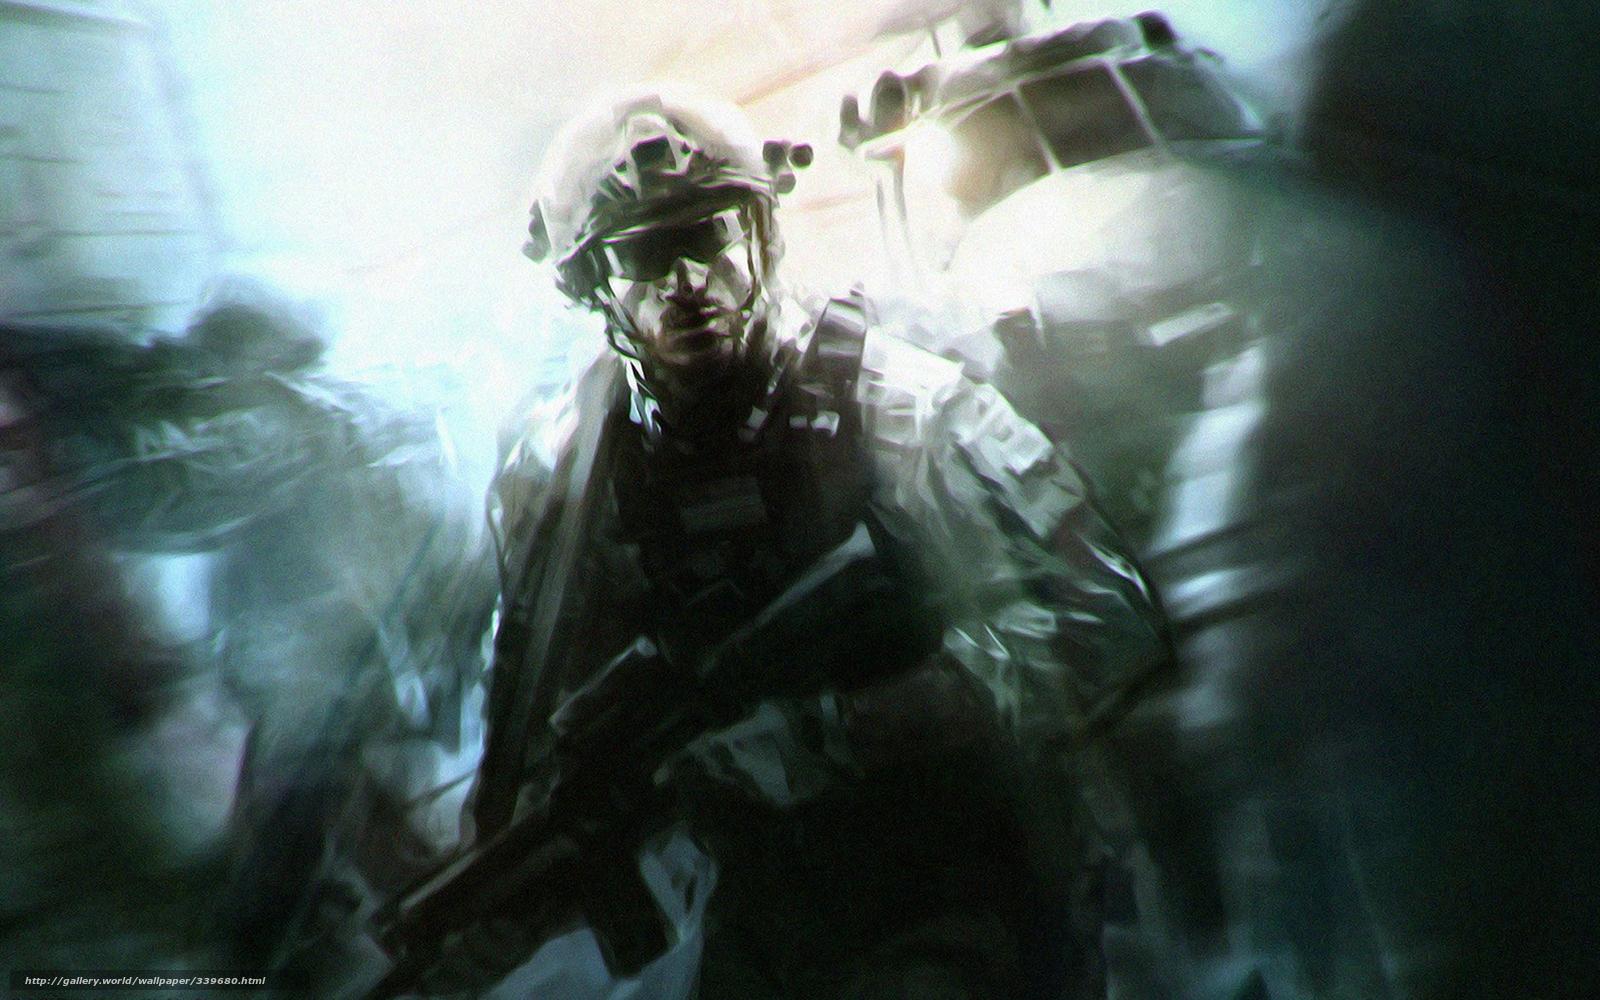 Download wallpaper Special Forces soldier desktop wallpaper in 1600x1000